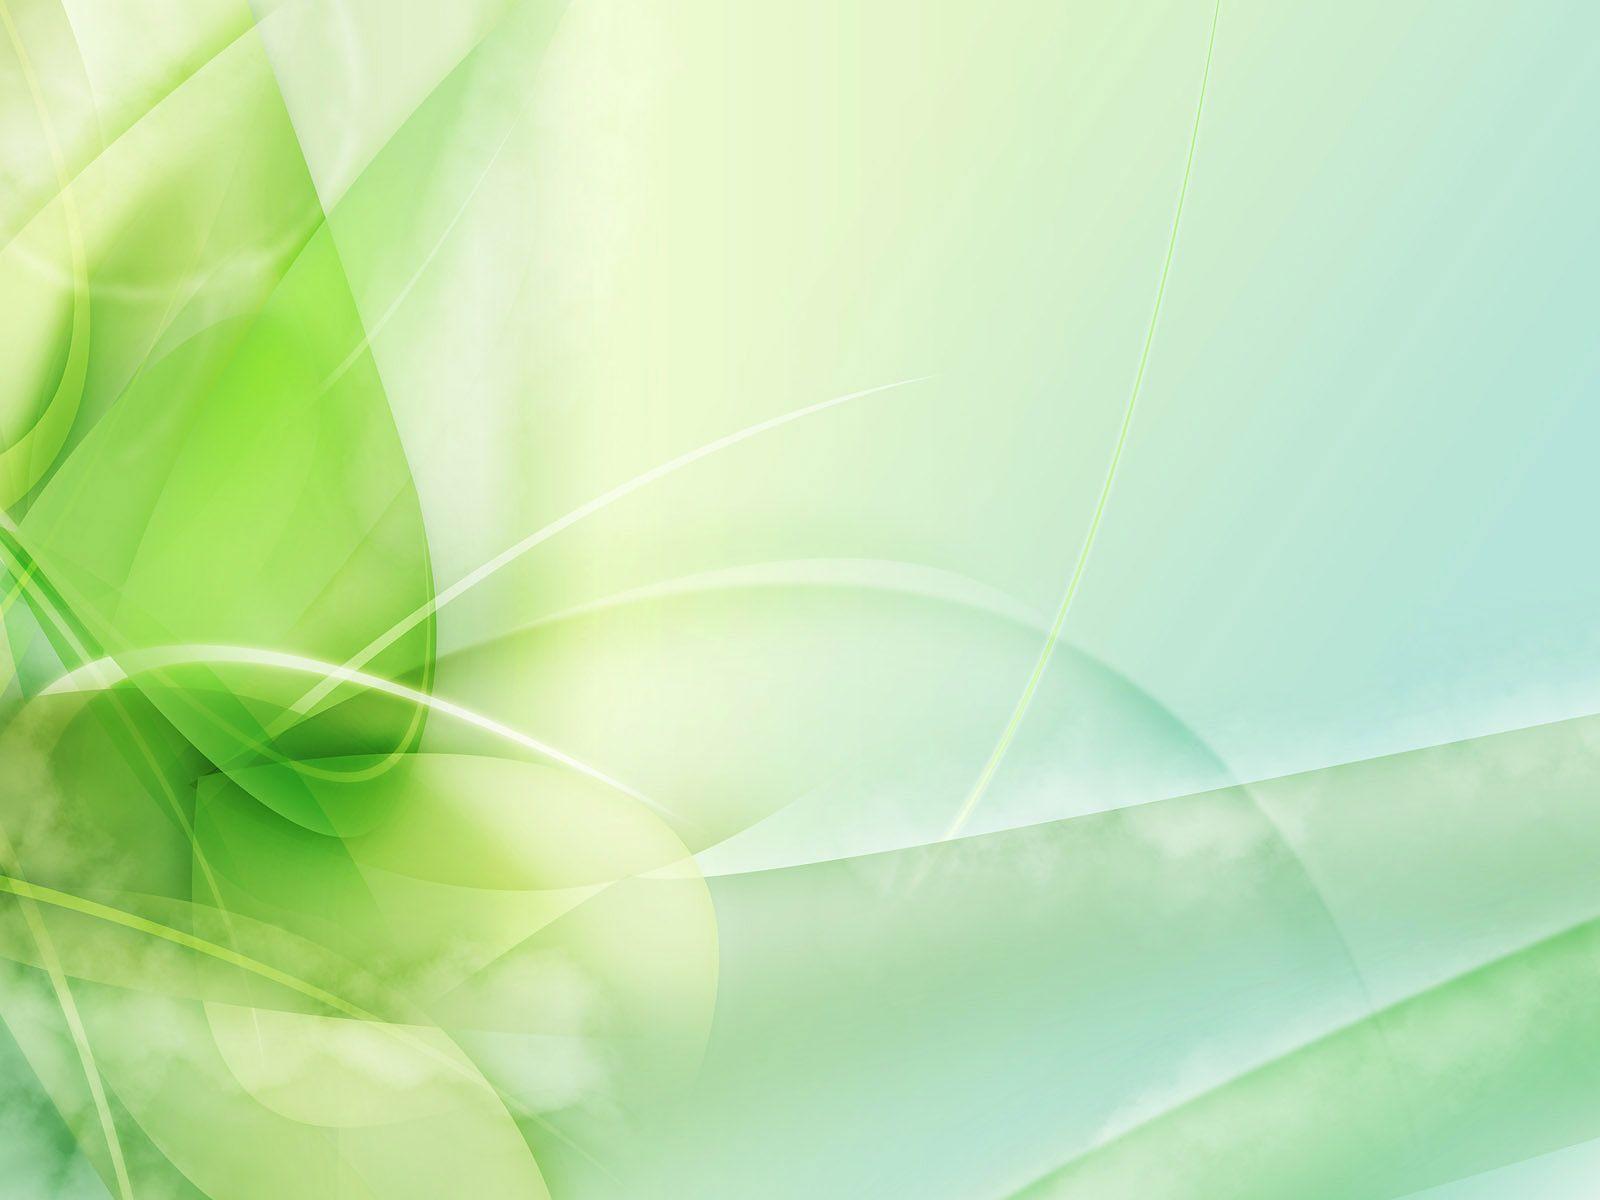 green grass texture nexus wallpapers nexus wallpapers and | hd, Powerpoint templates